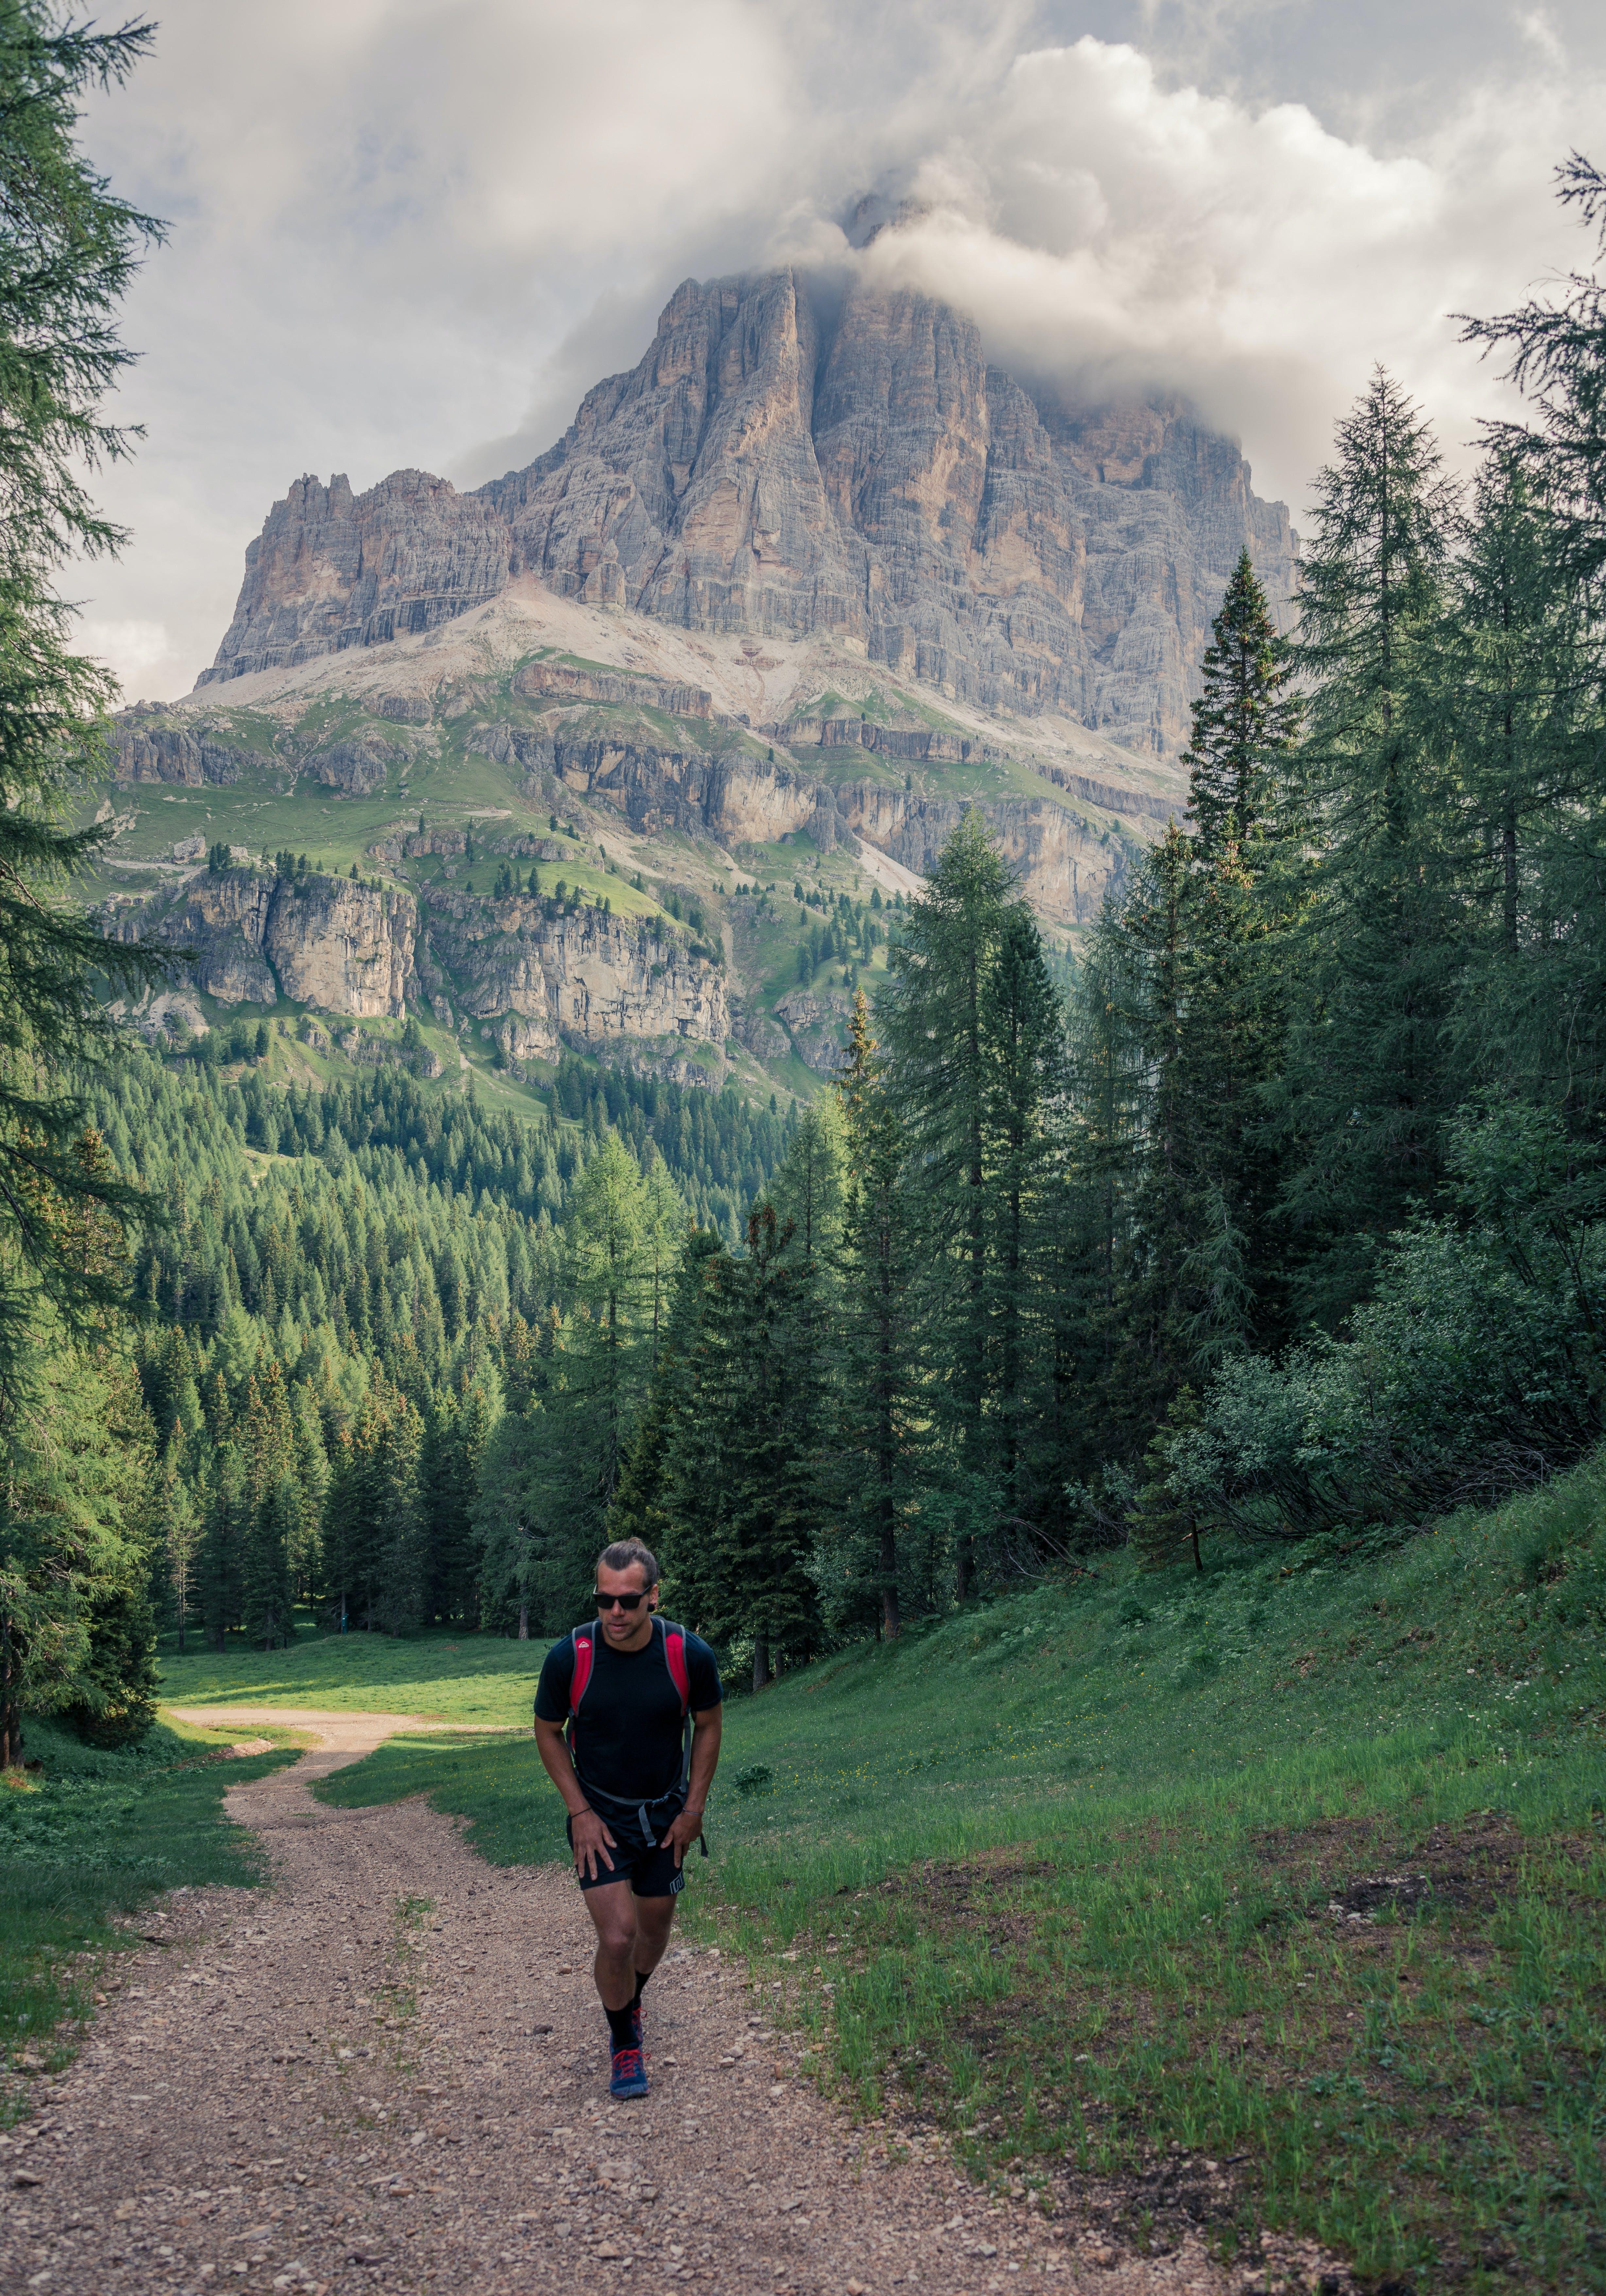 Man Walking Near Pine Trees and Mountain